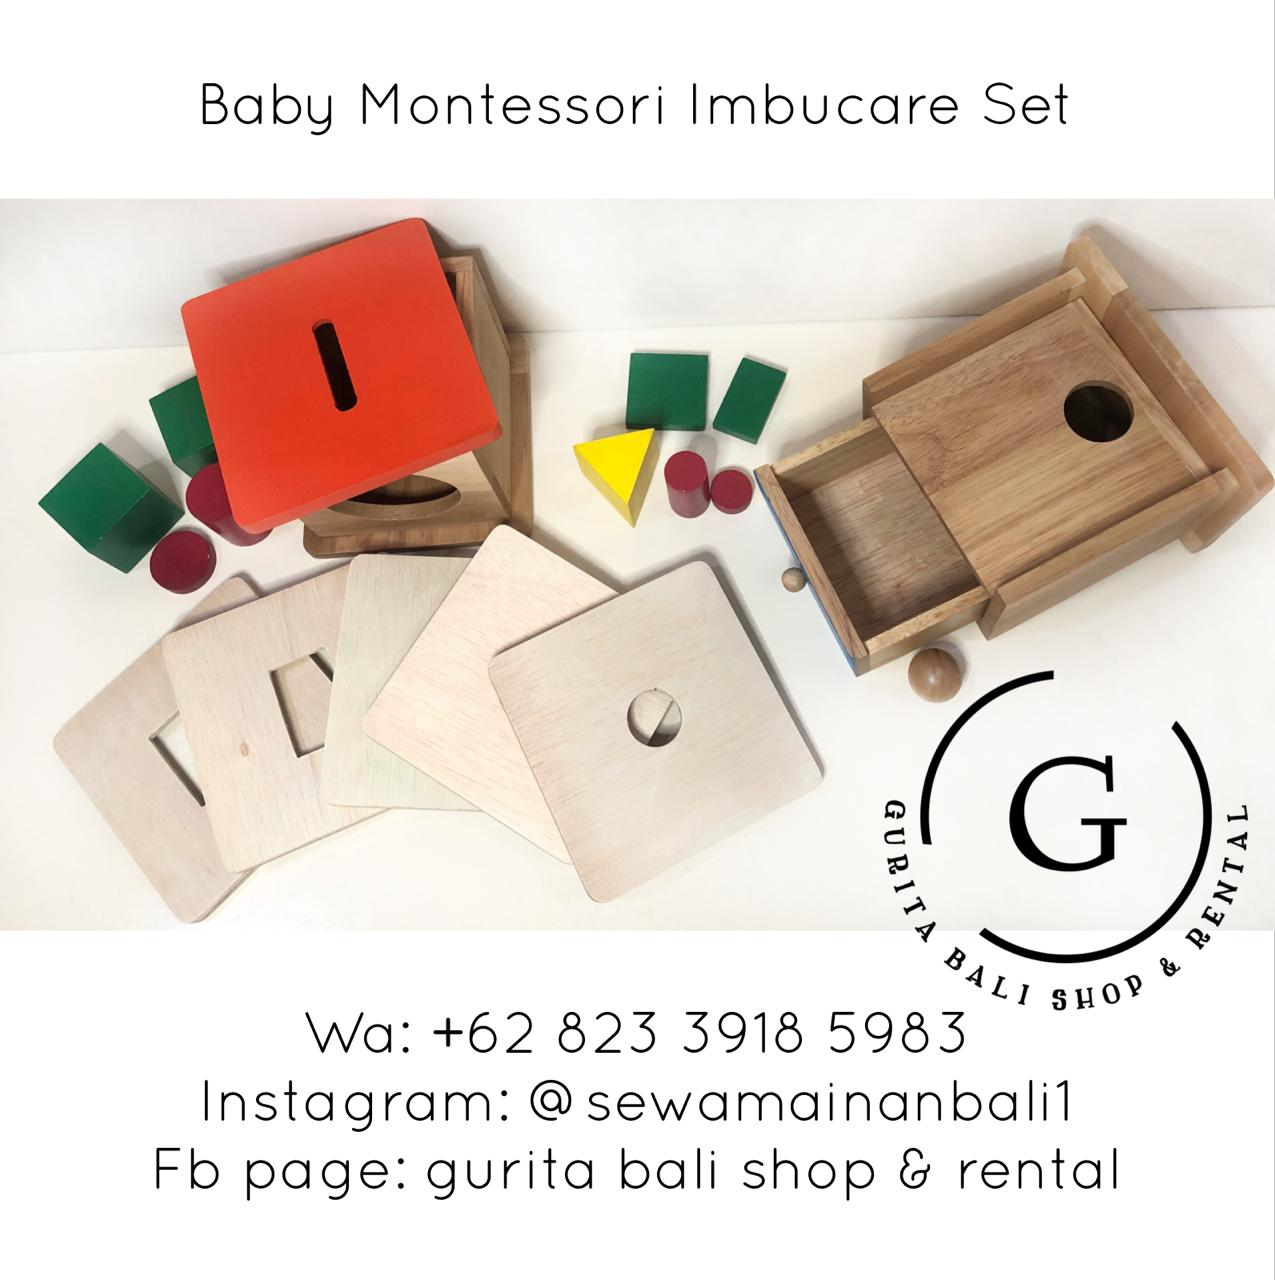 BABY MONTESSORI IMBUCARE SET